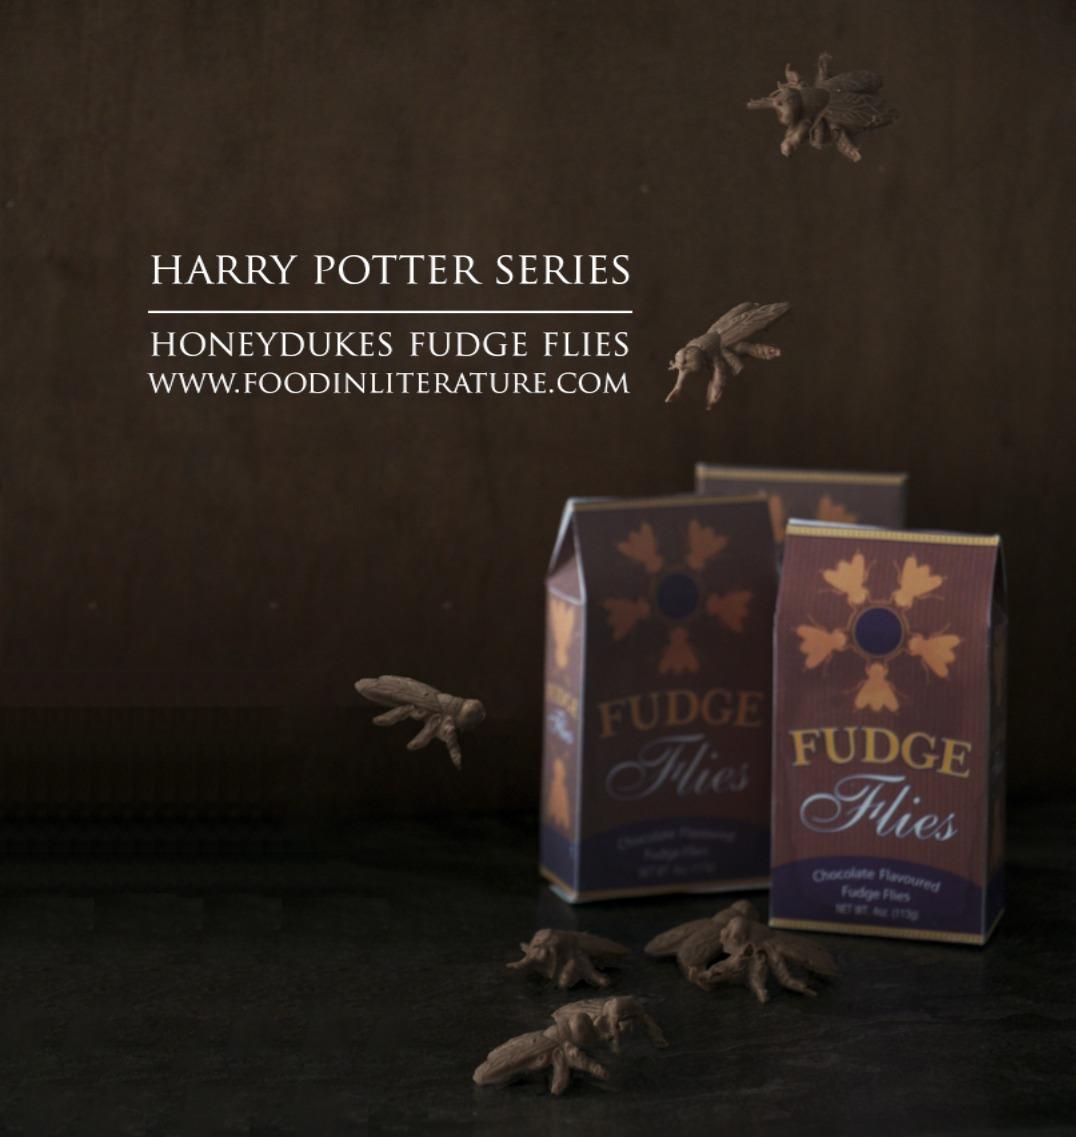 Honeydukes Fudge Flies recipe| Harry Potter Series | Food in Literature